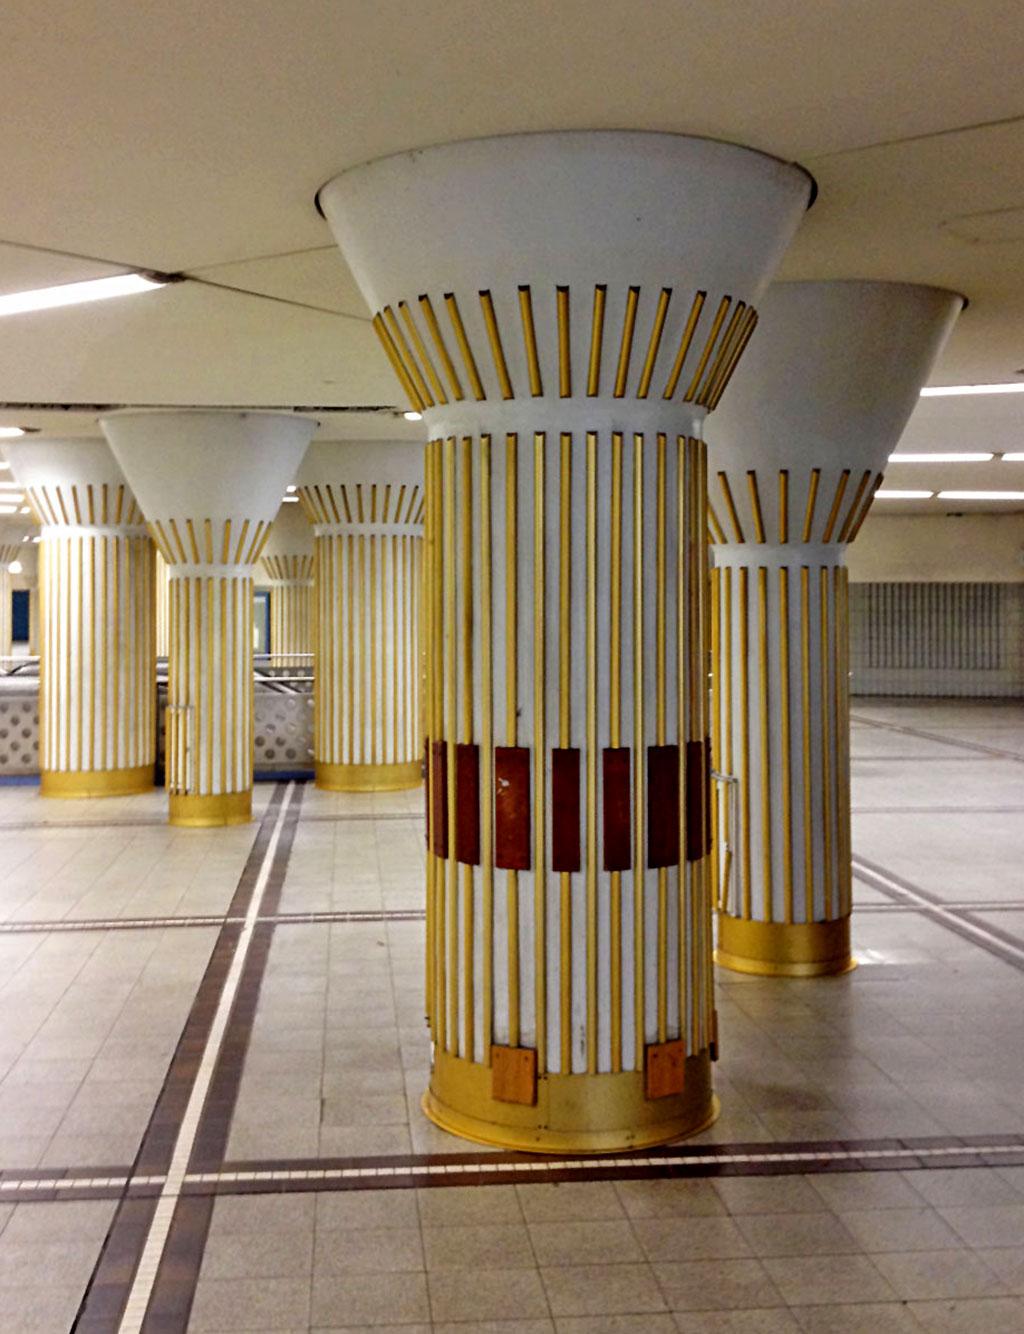 U Bahn Station Bockenheimer Warte